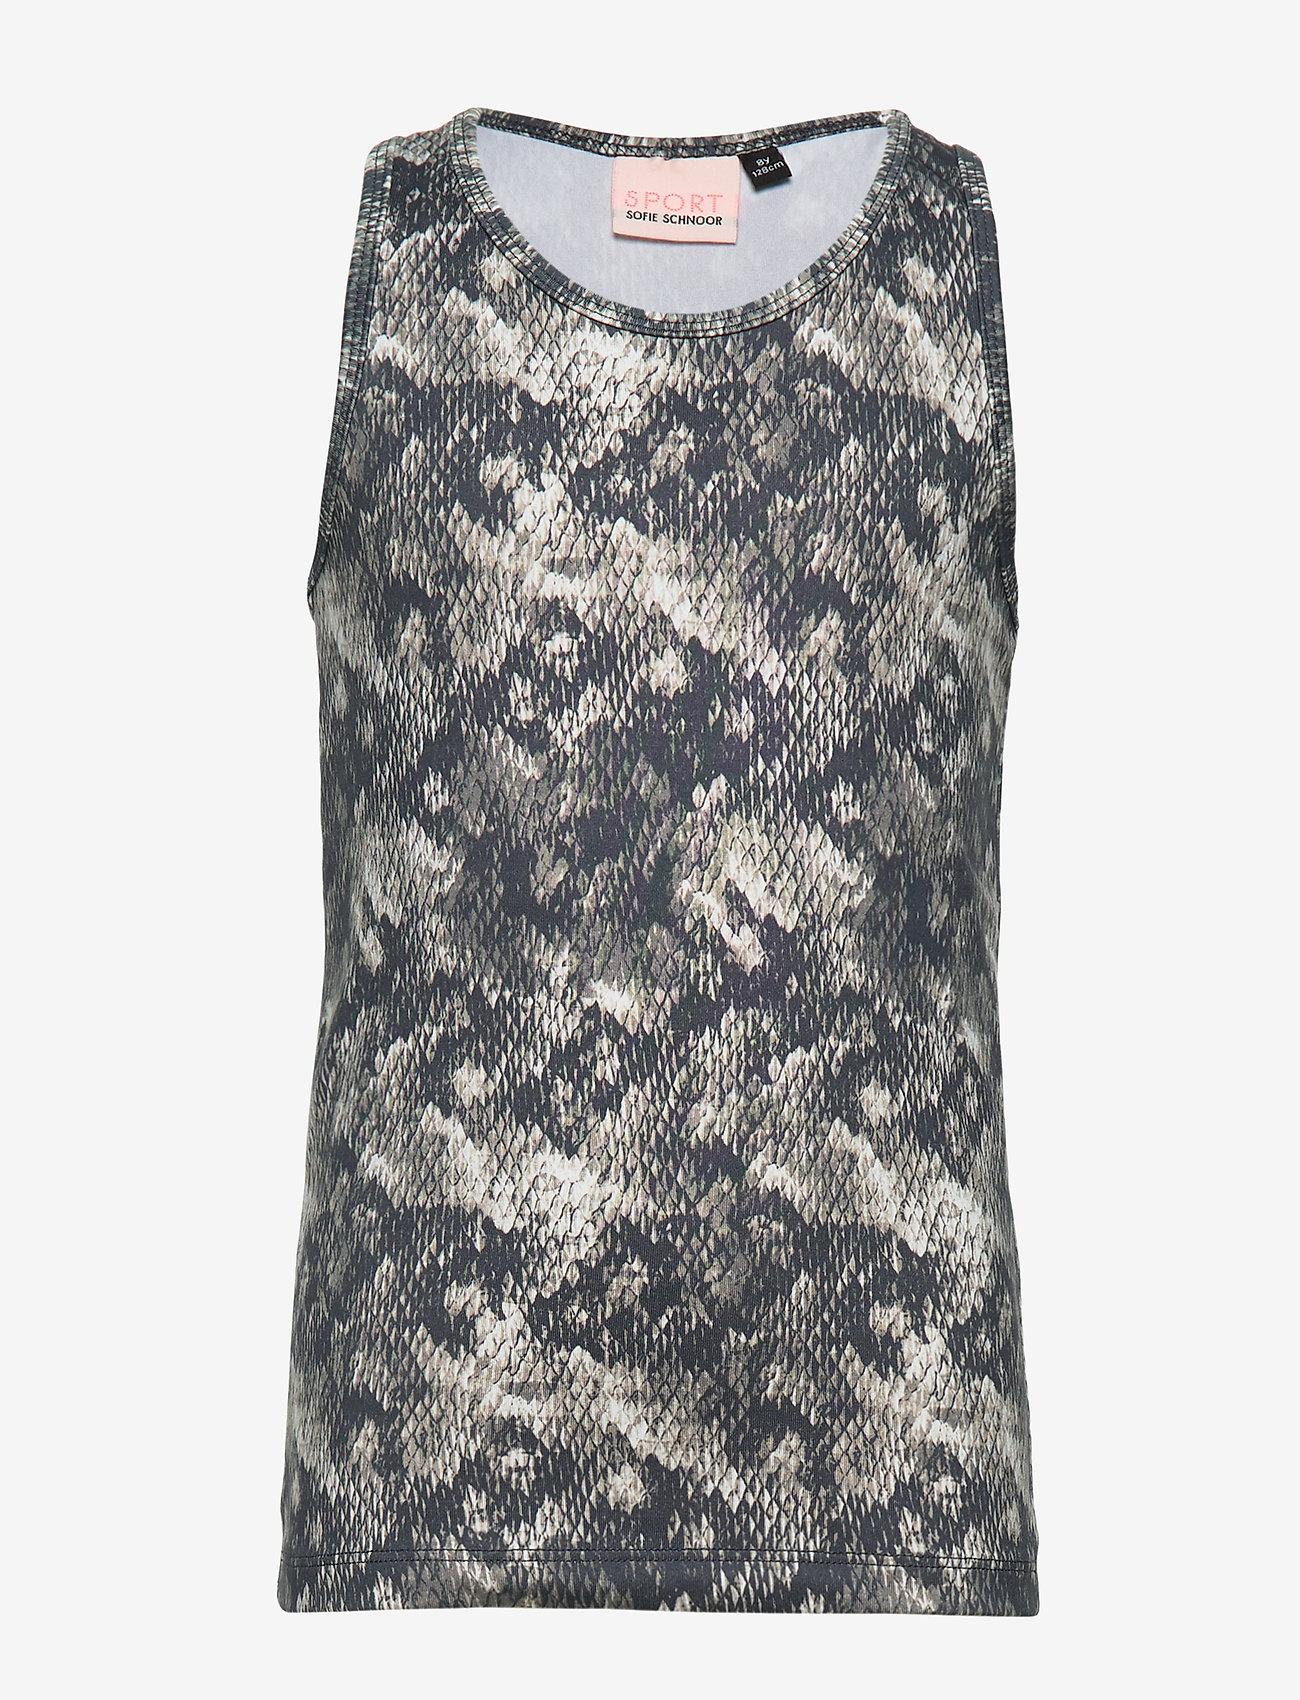 Petit by Sofie Schnoor - Top - sleeveless tops - black - 0